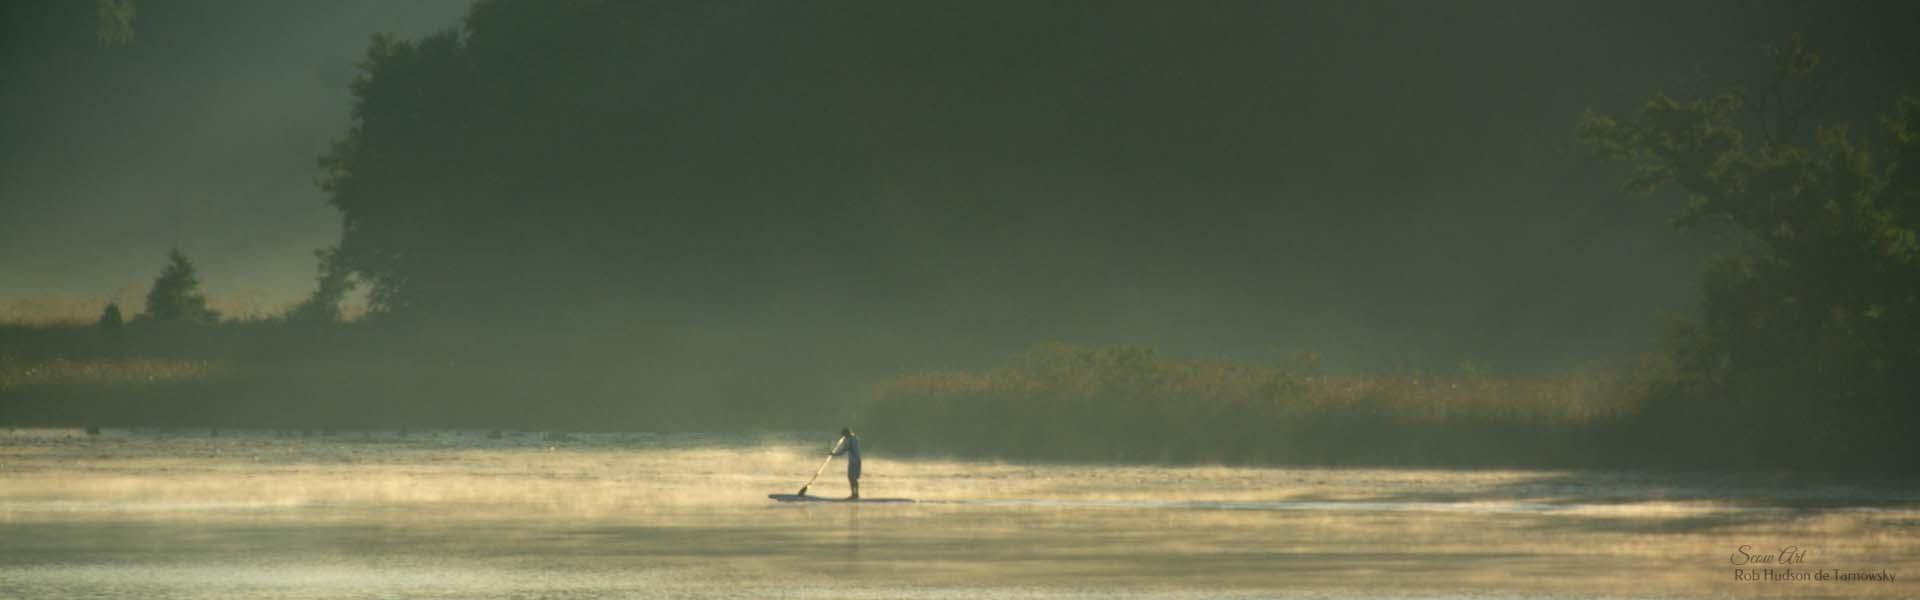 Paddleboarding on Lake Beulah